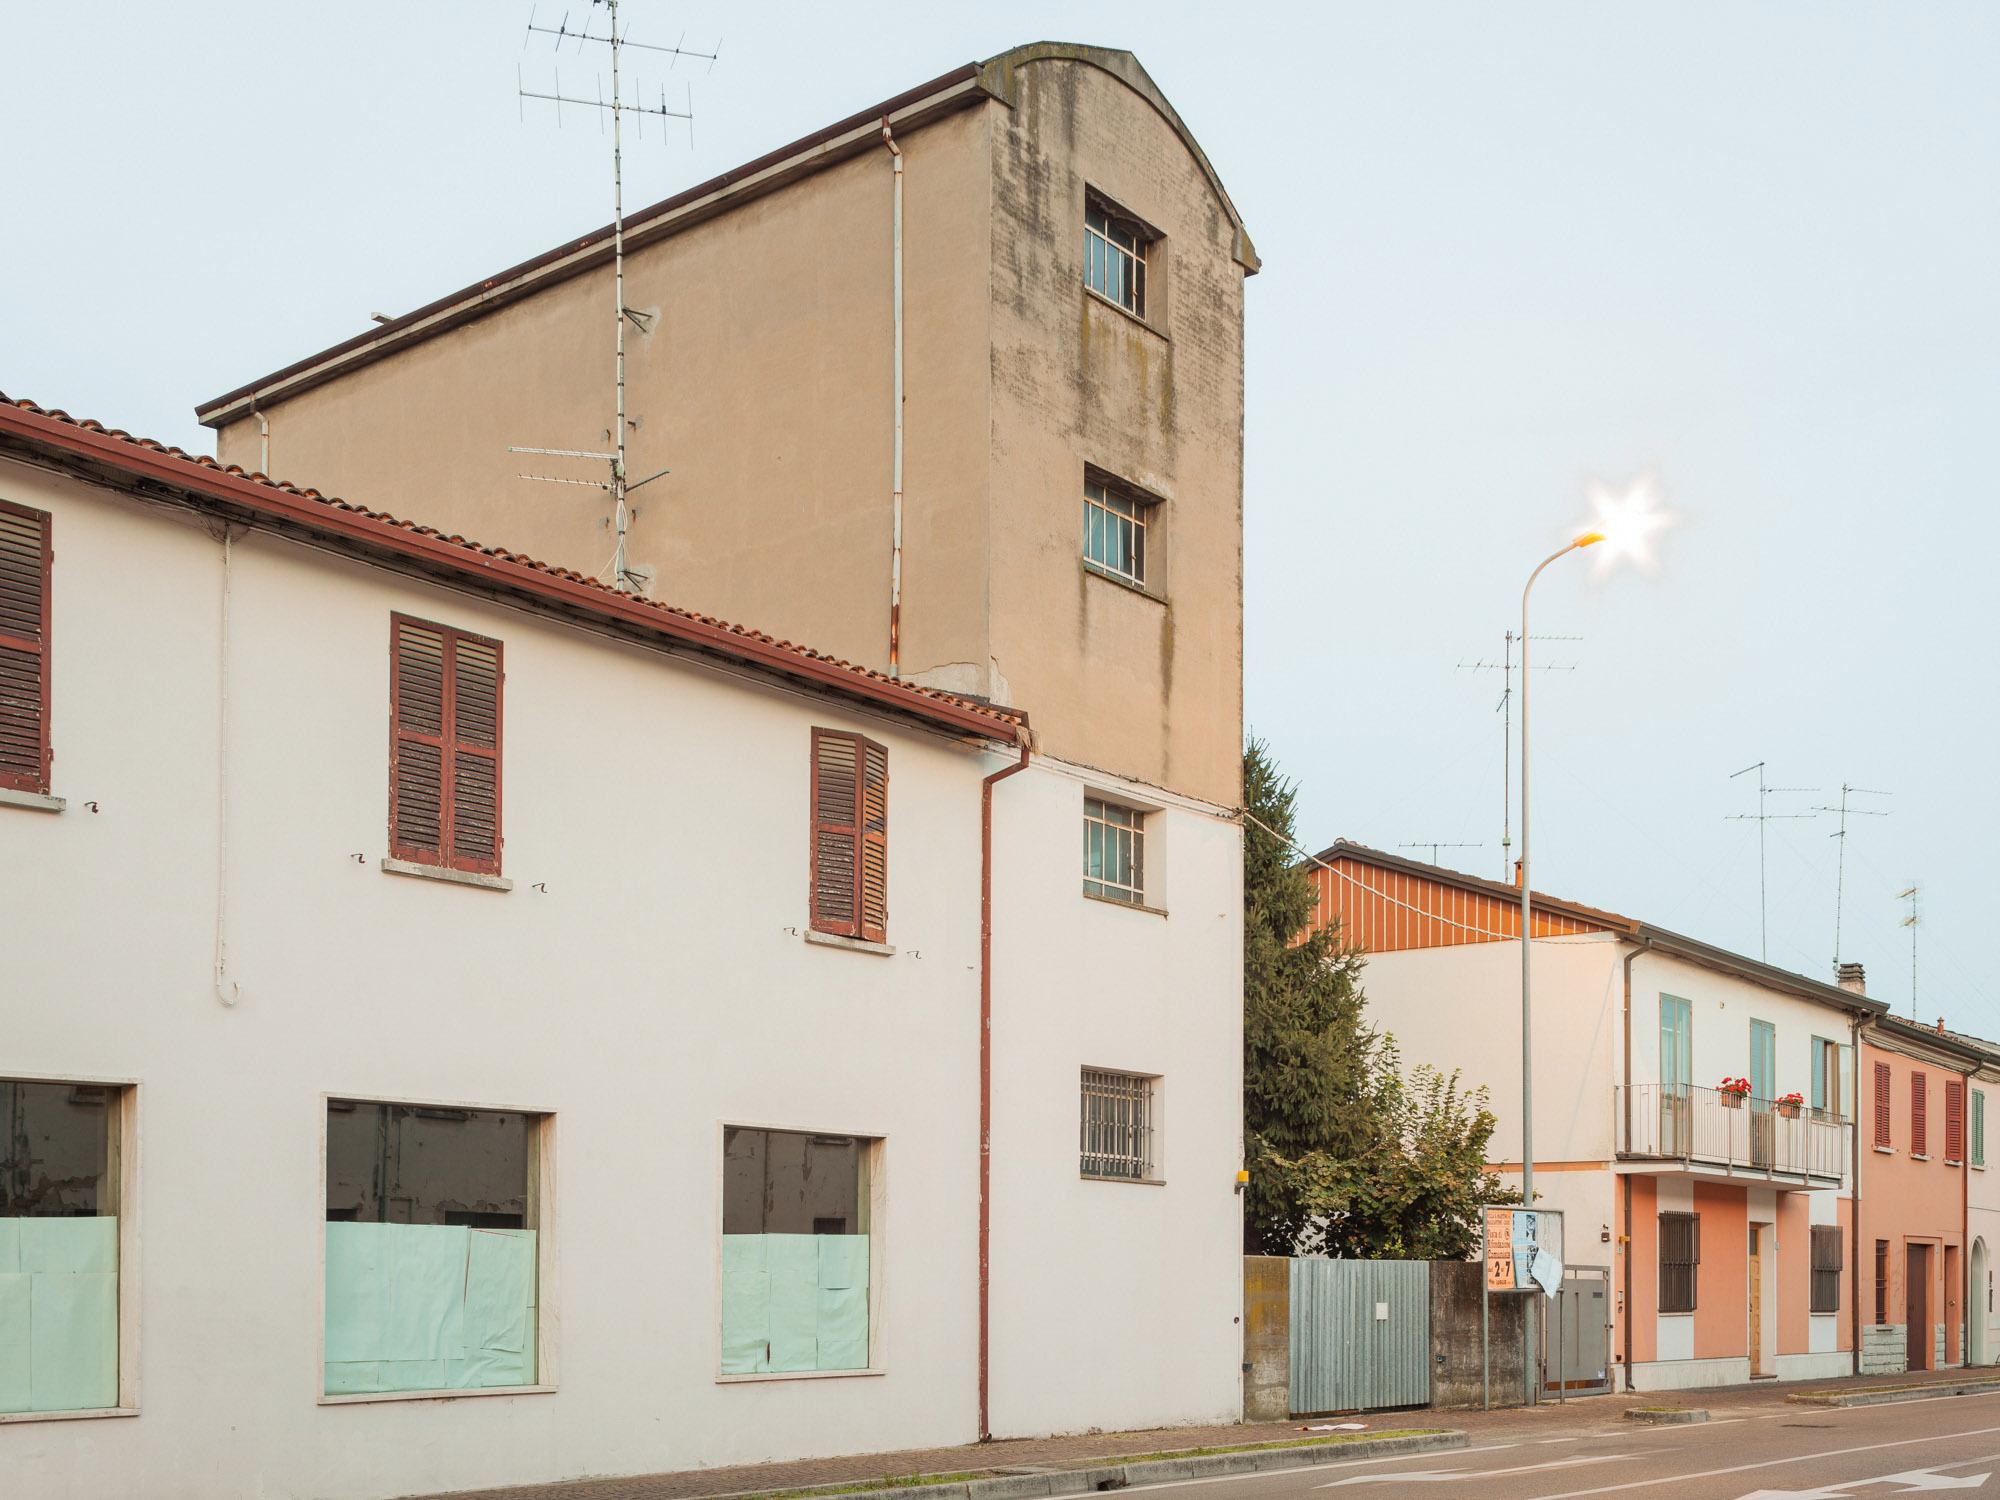 Lugo-2953.jpg